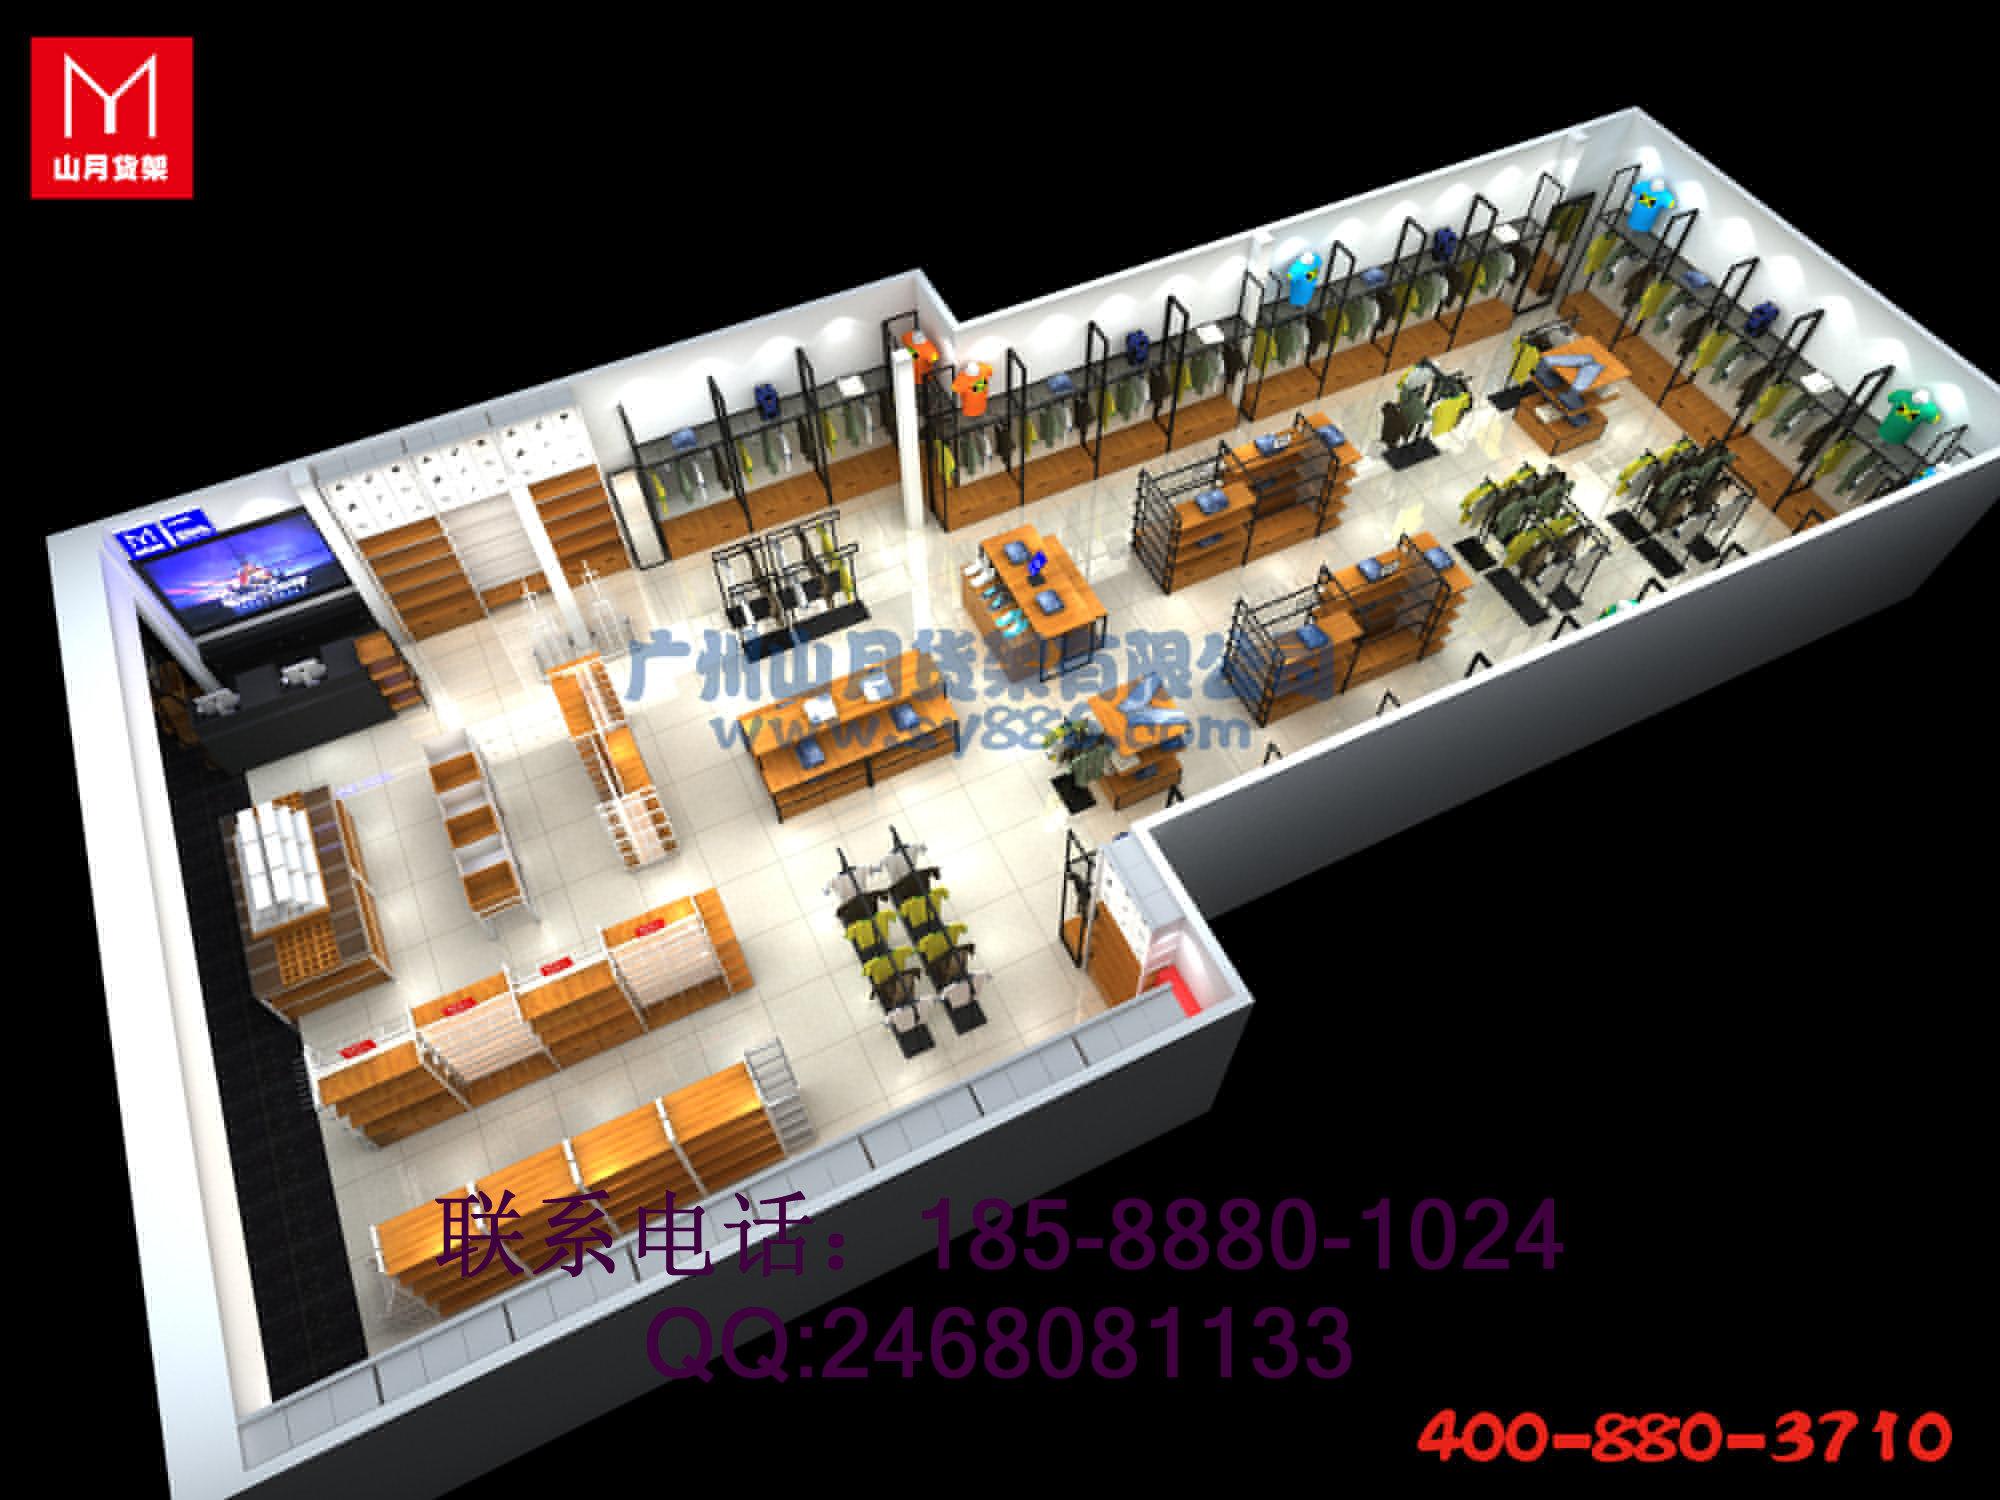 KM服装货架、VR女装展示柜、GT男士服装货架、SQ男士服装架、涵着女装服装架